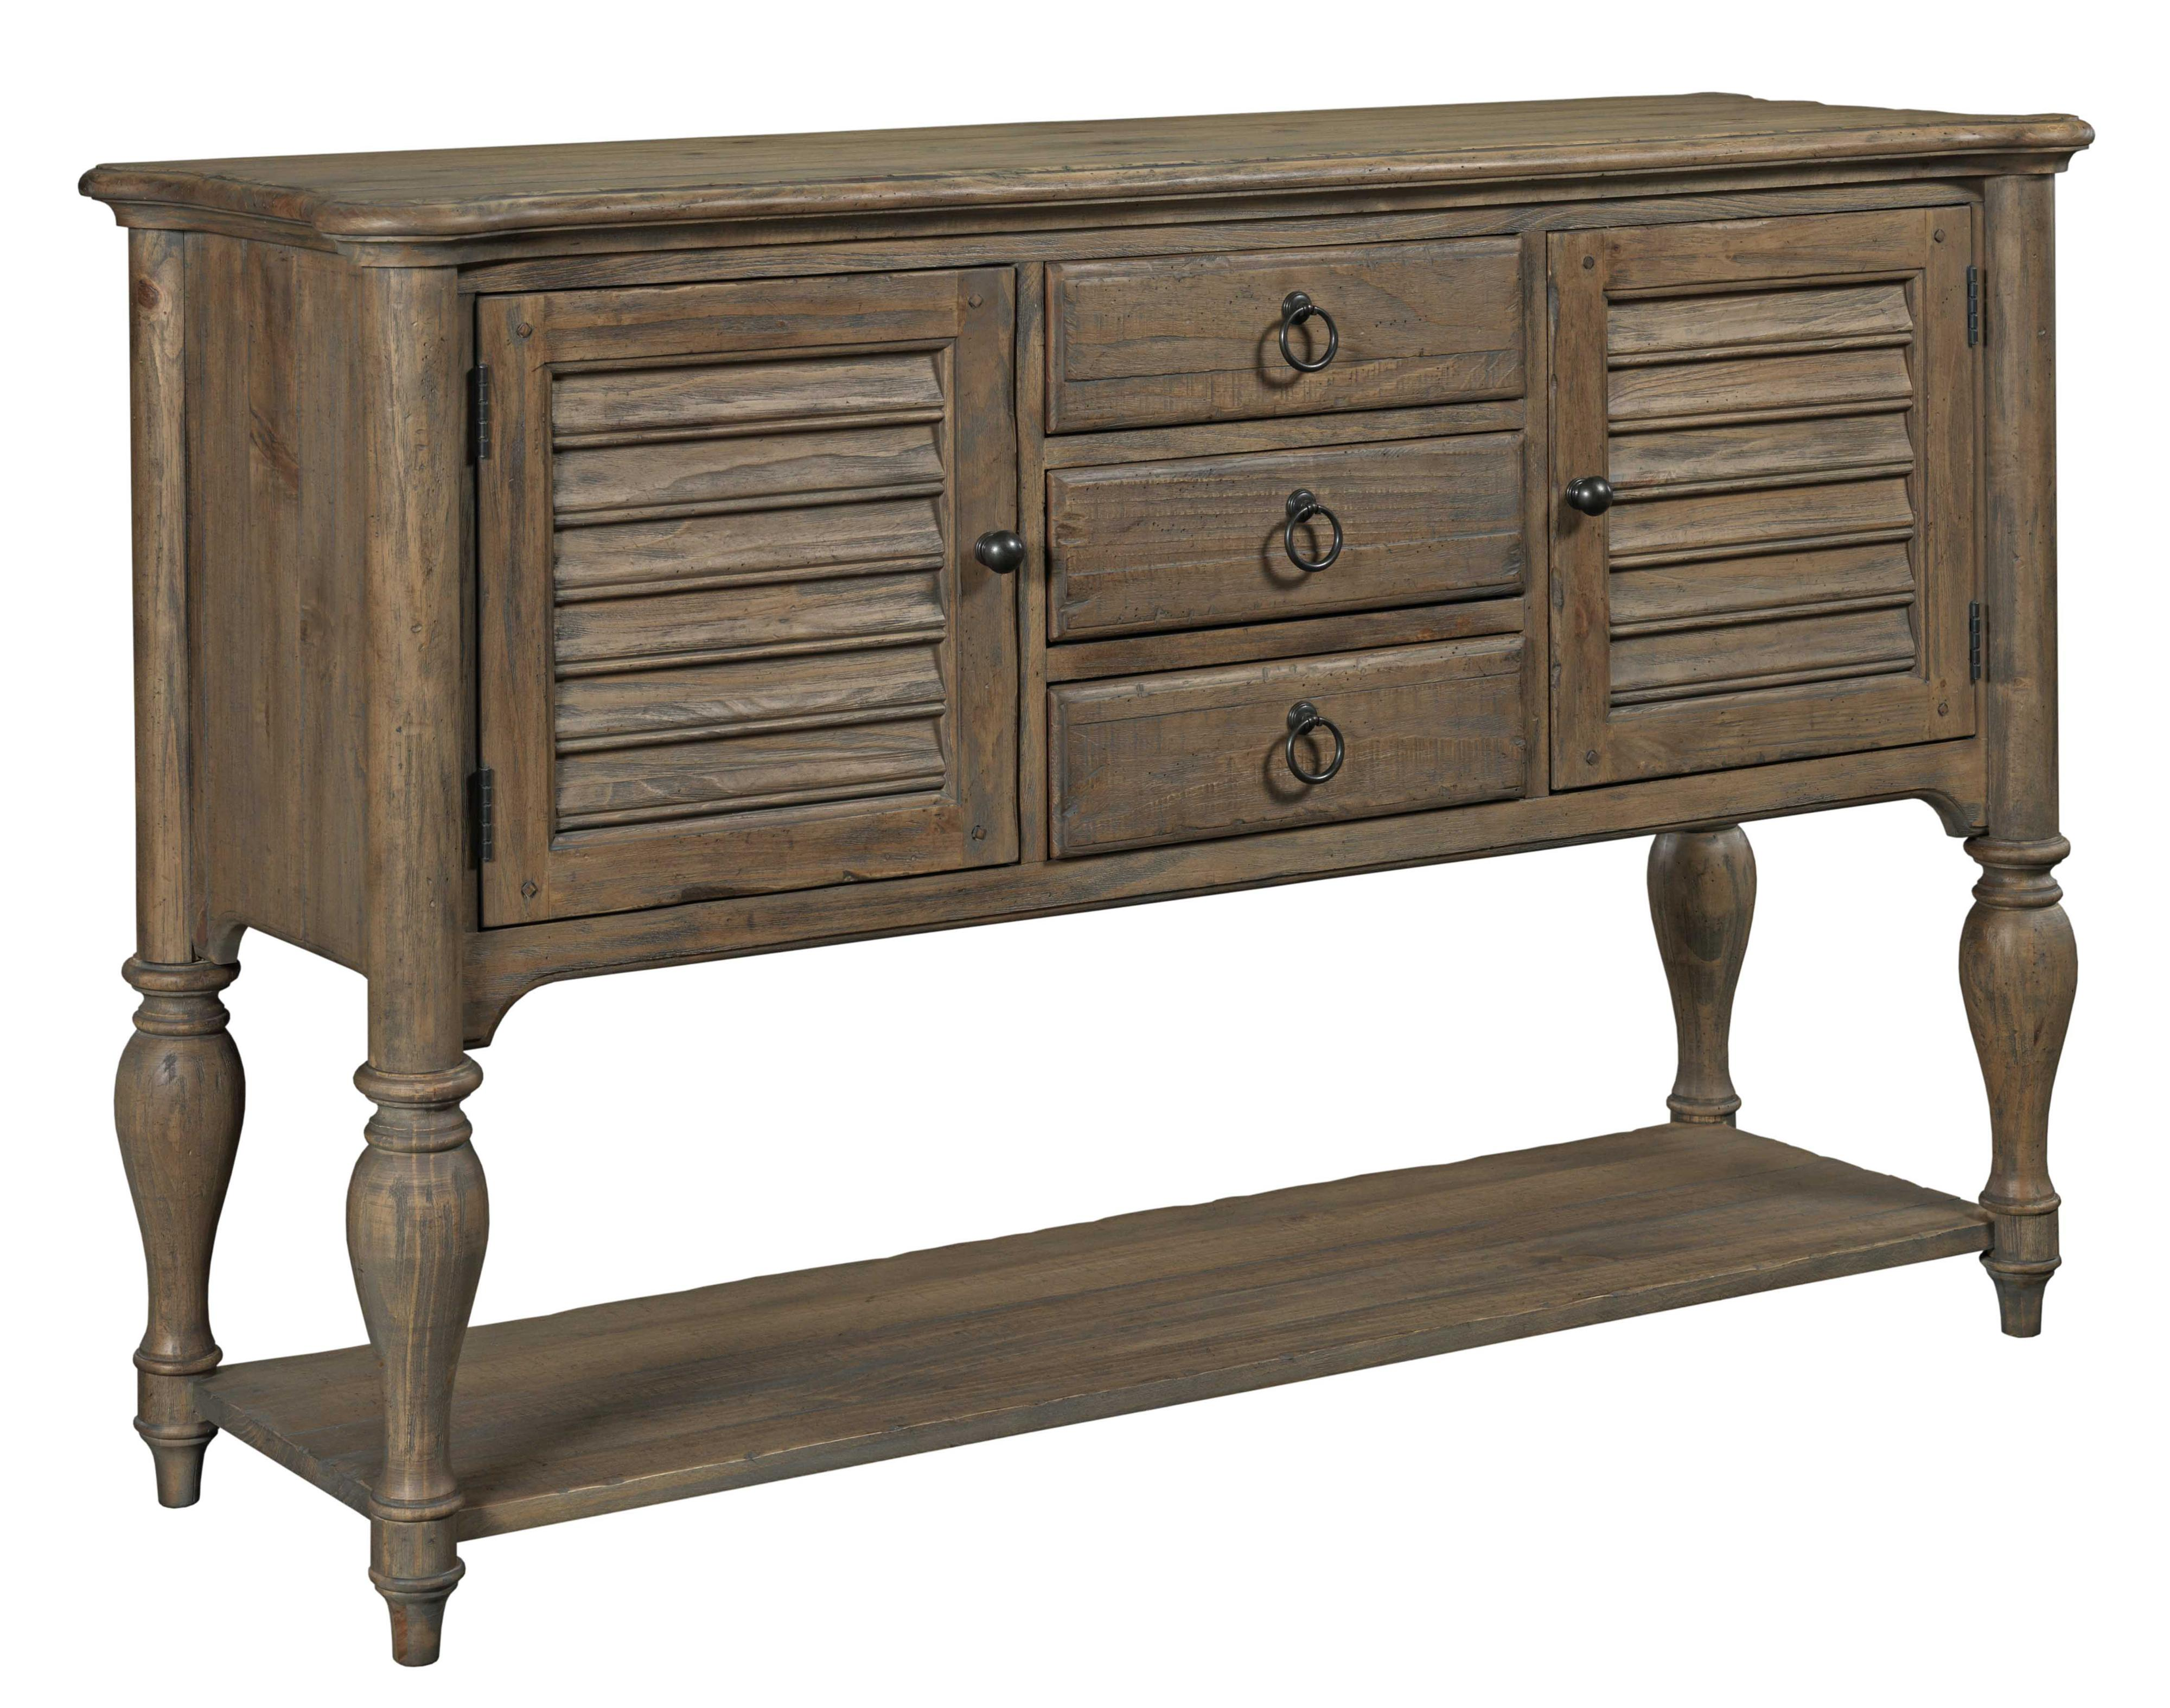 Weatherford Edisto Sideboard by Kincaid Furniture at Johnny Janosik